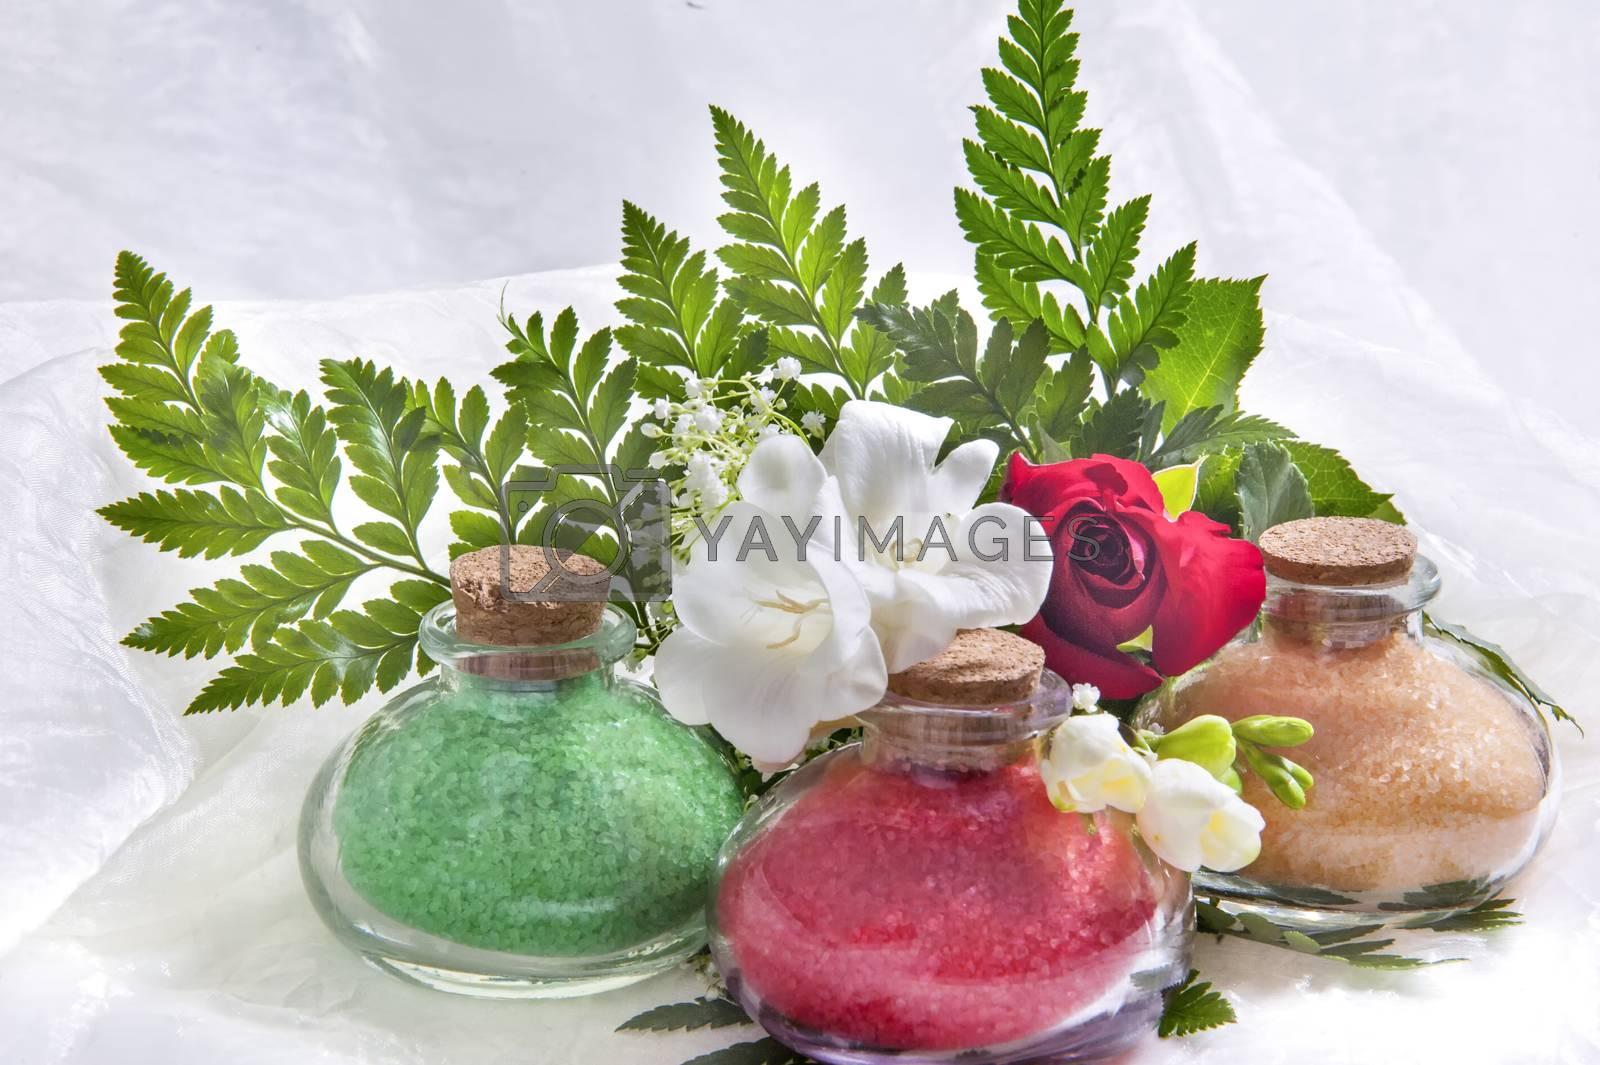 a Glass flasks containing a bath salts